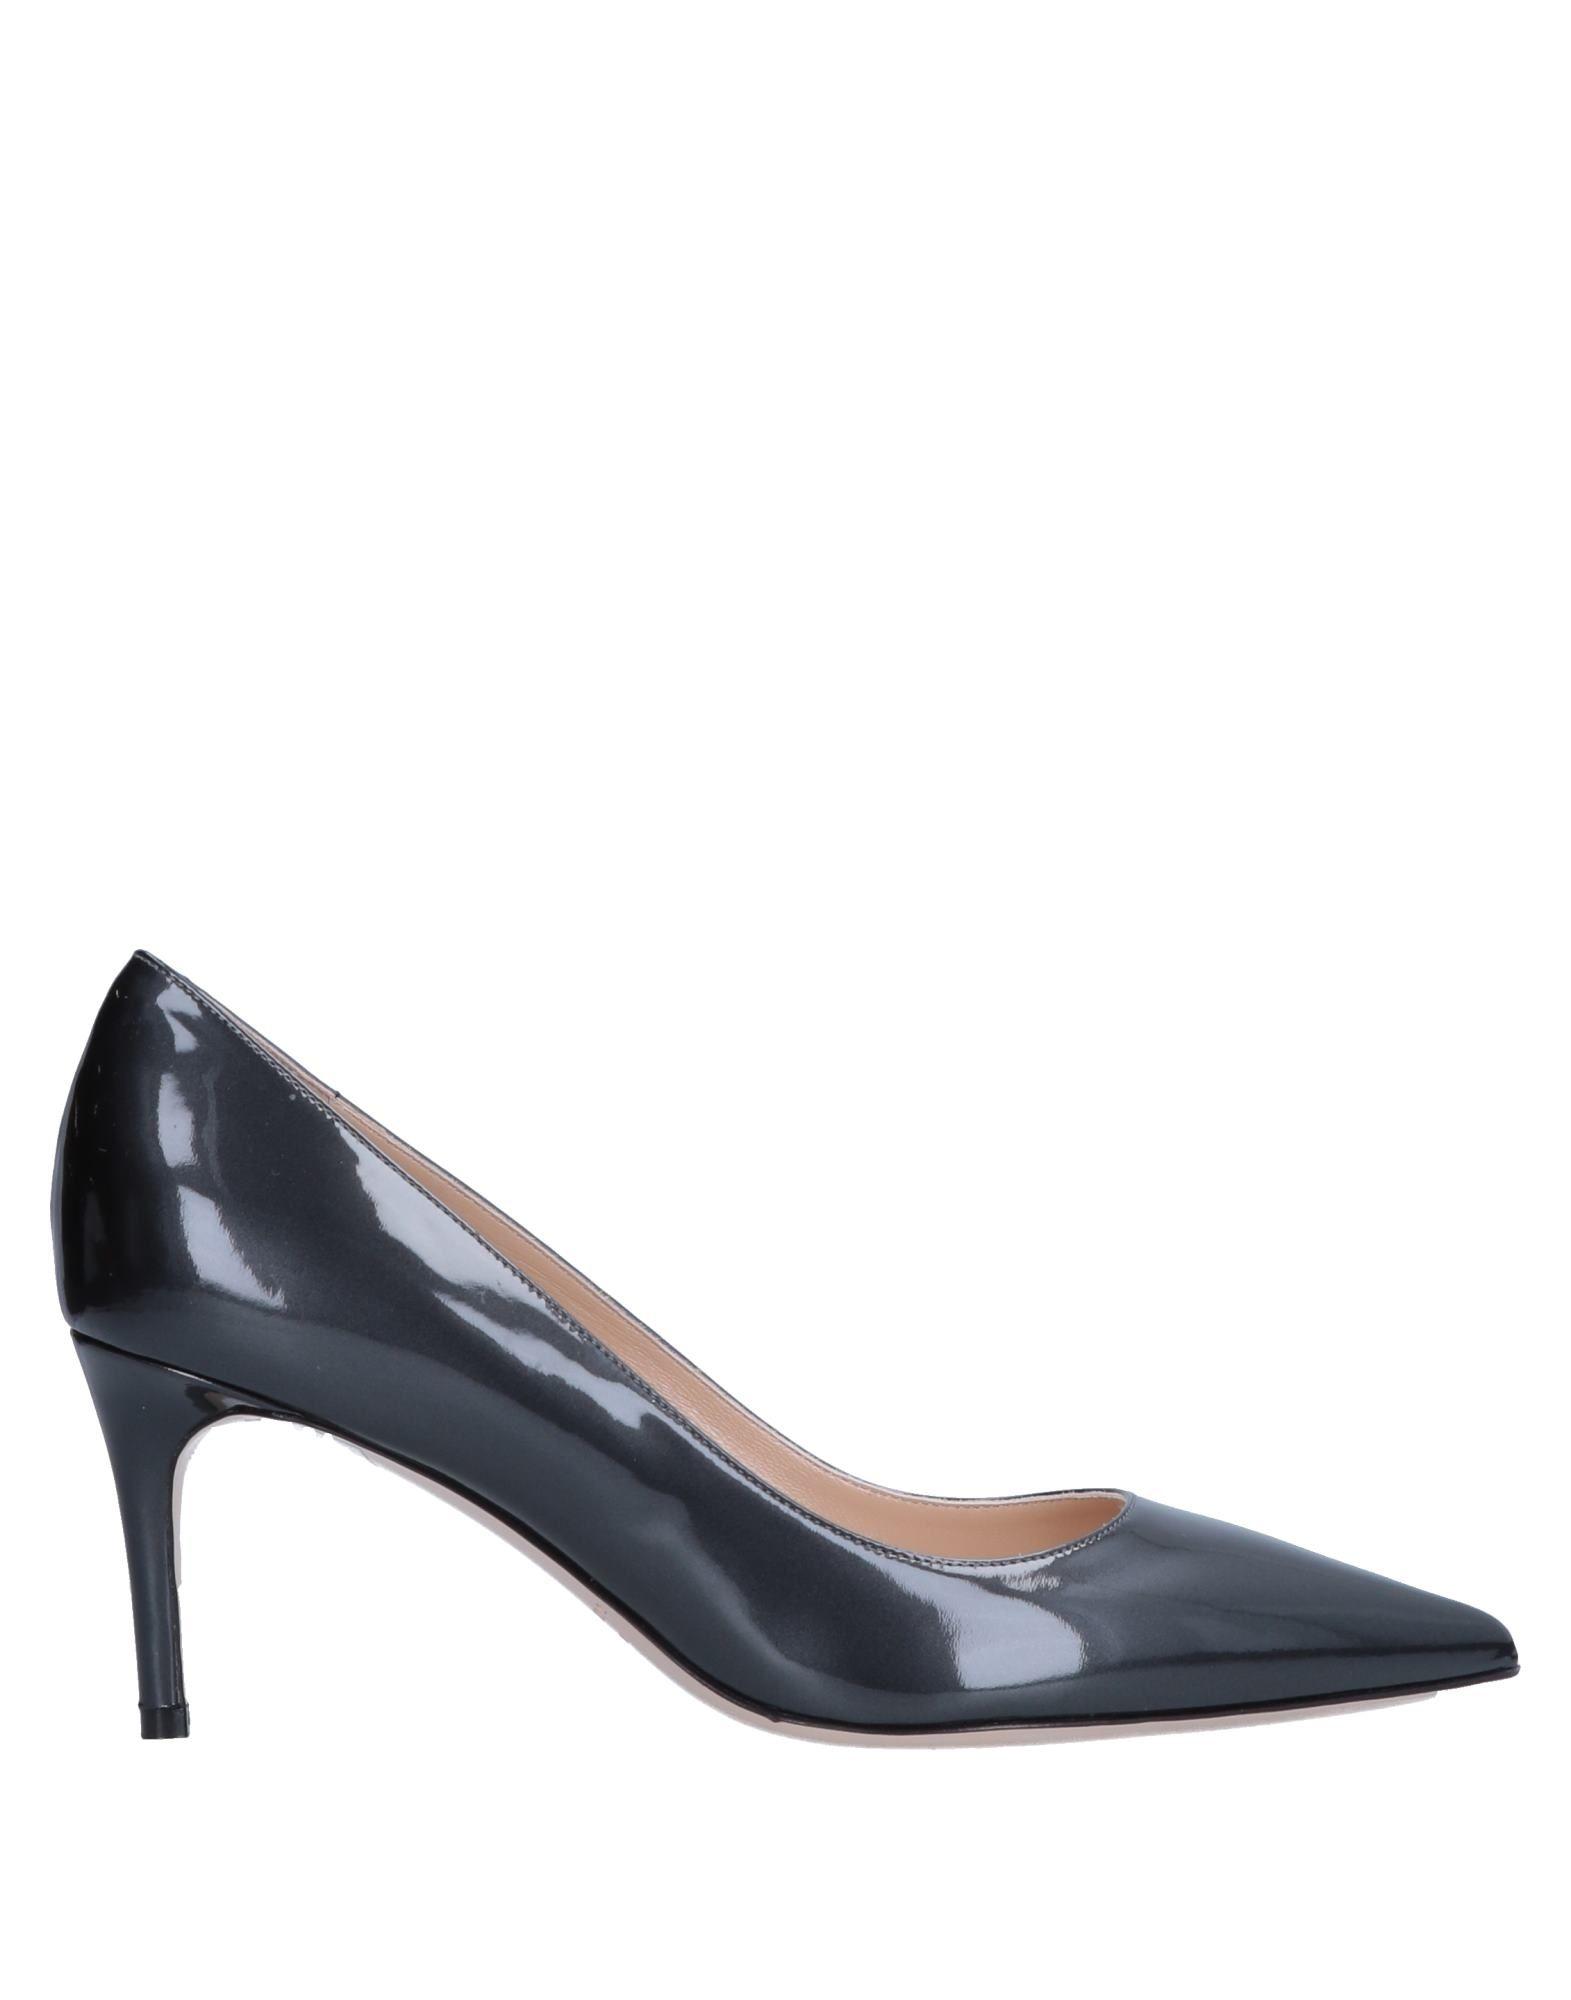 Mocassino Cult offerte Donna - 11467602BR Nuove offerte Cult e scarpe comode 816119